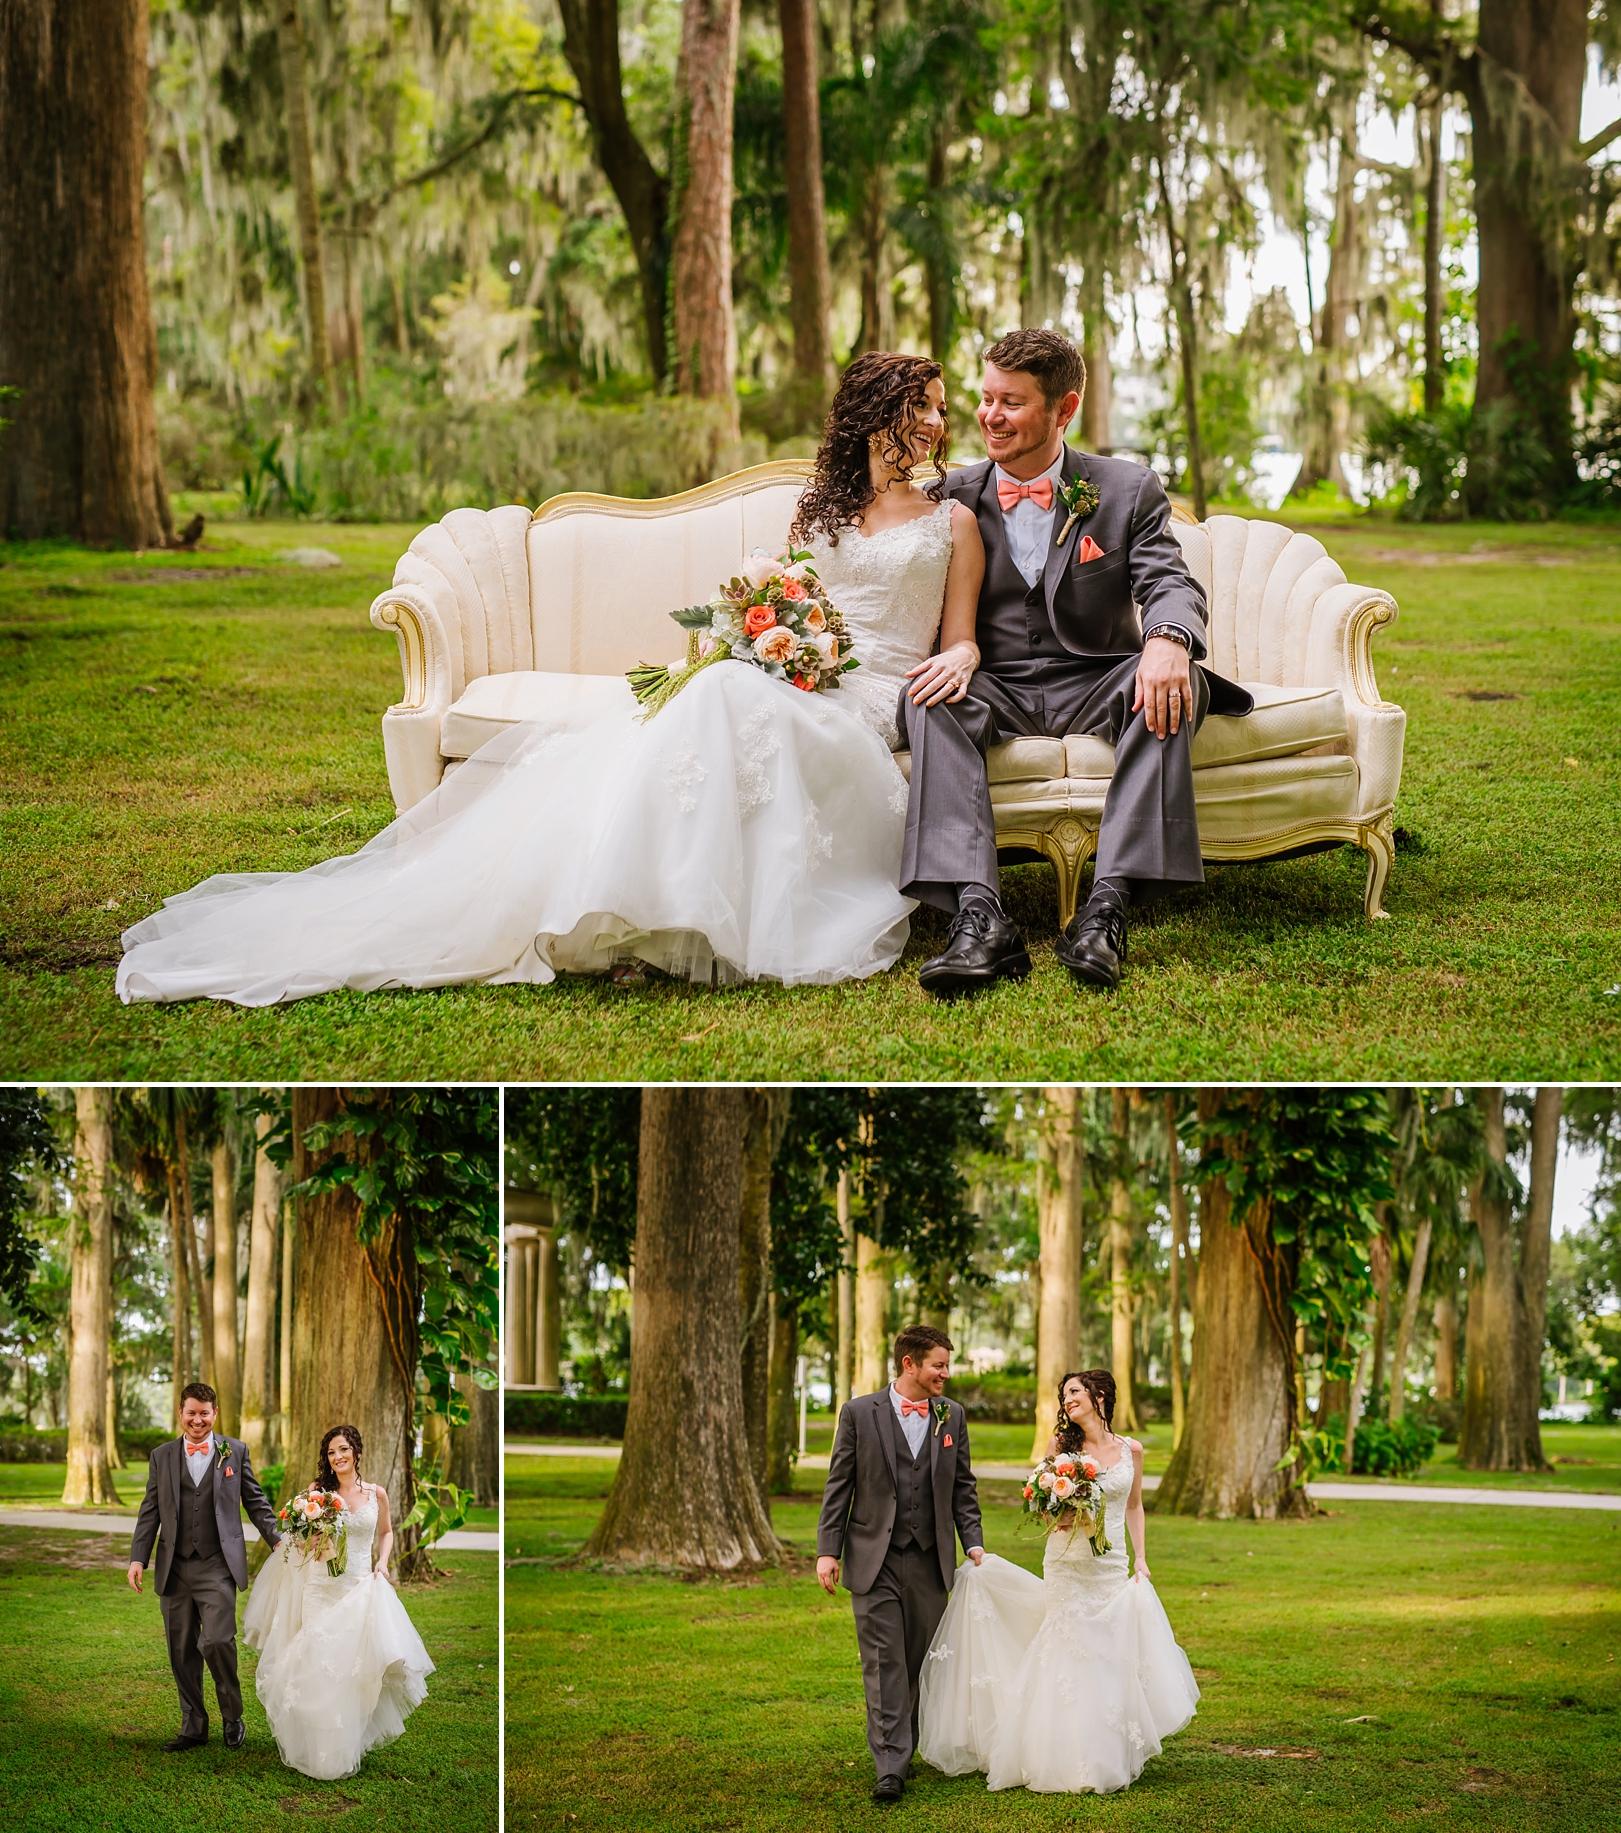 kraft-azalea-gardens-stylish-elopment-wedding-photography_0019.jpg